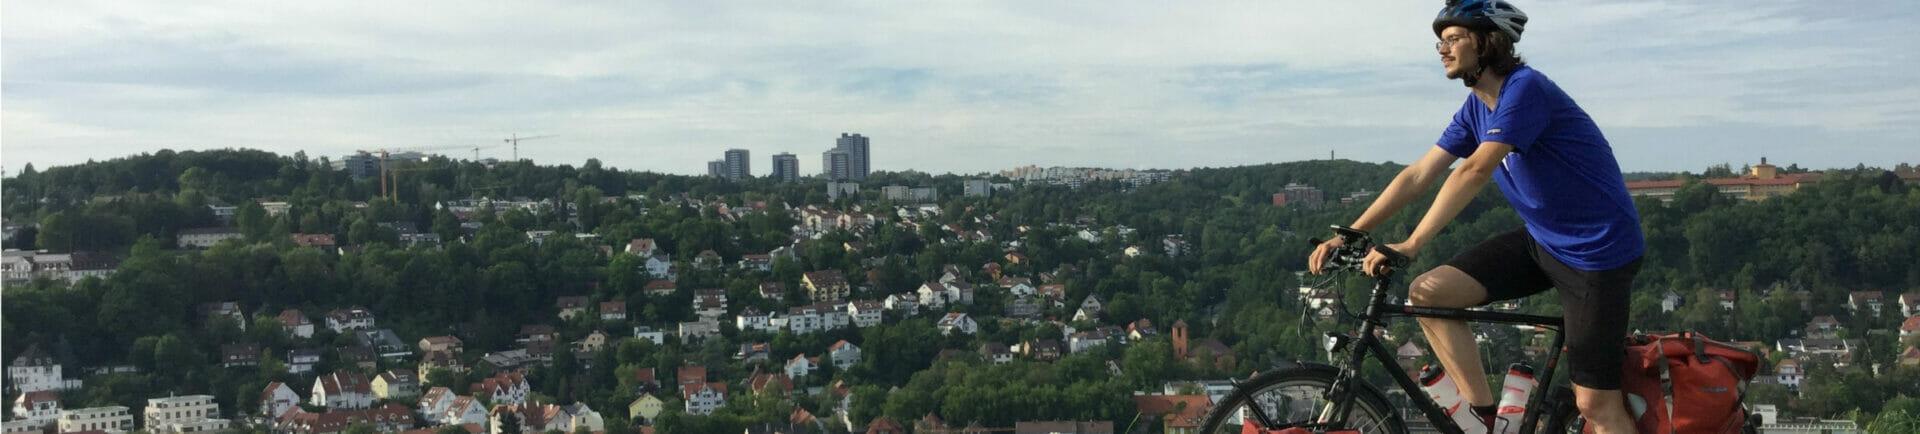 Tübingen - Österberg - Neckarradweg - Unterkünfte in Tübingen